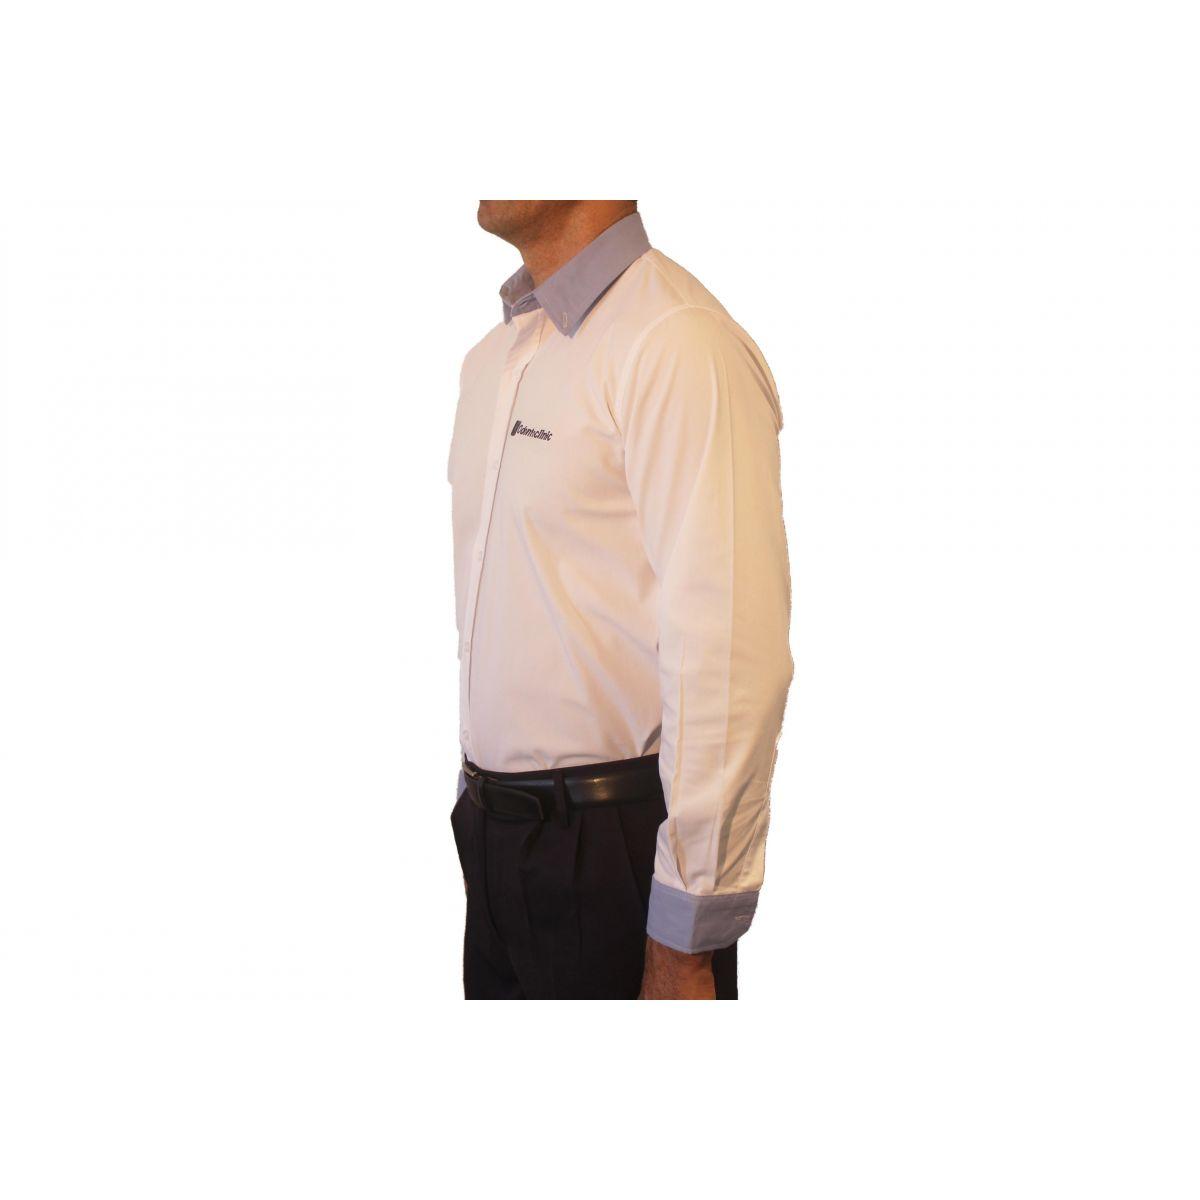 Camisa Social Masculina Manga Longa  - Uniformes Odontoclinic